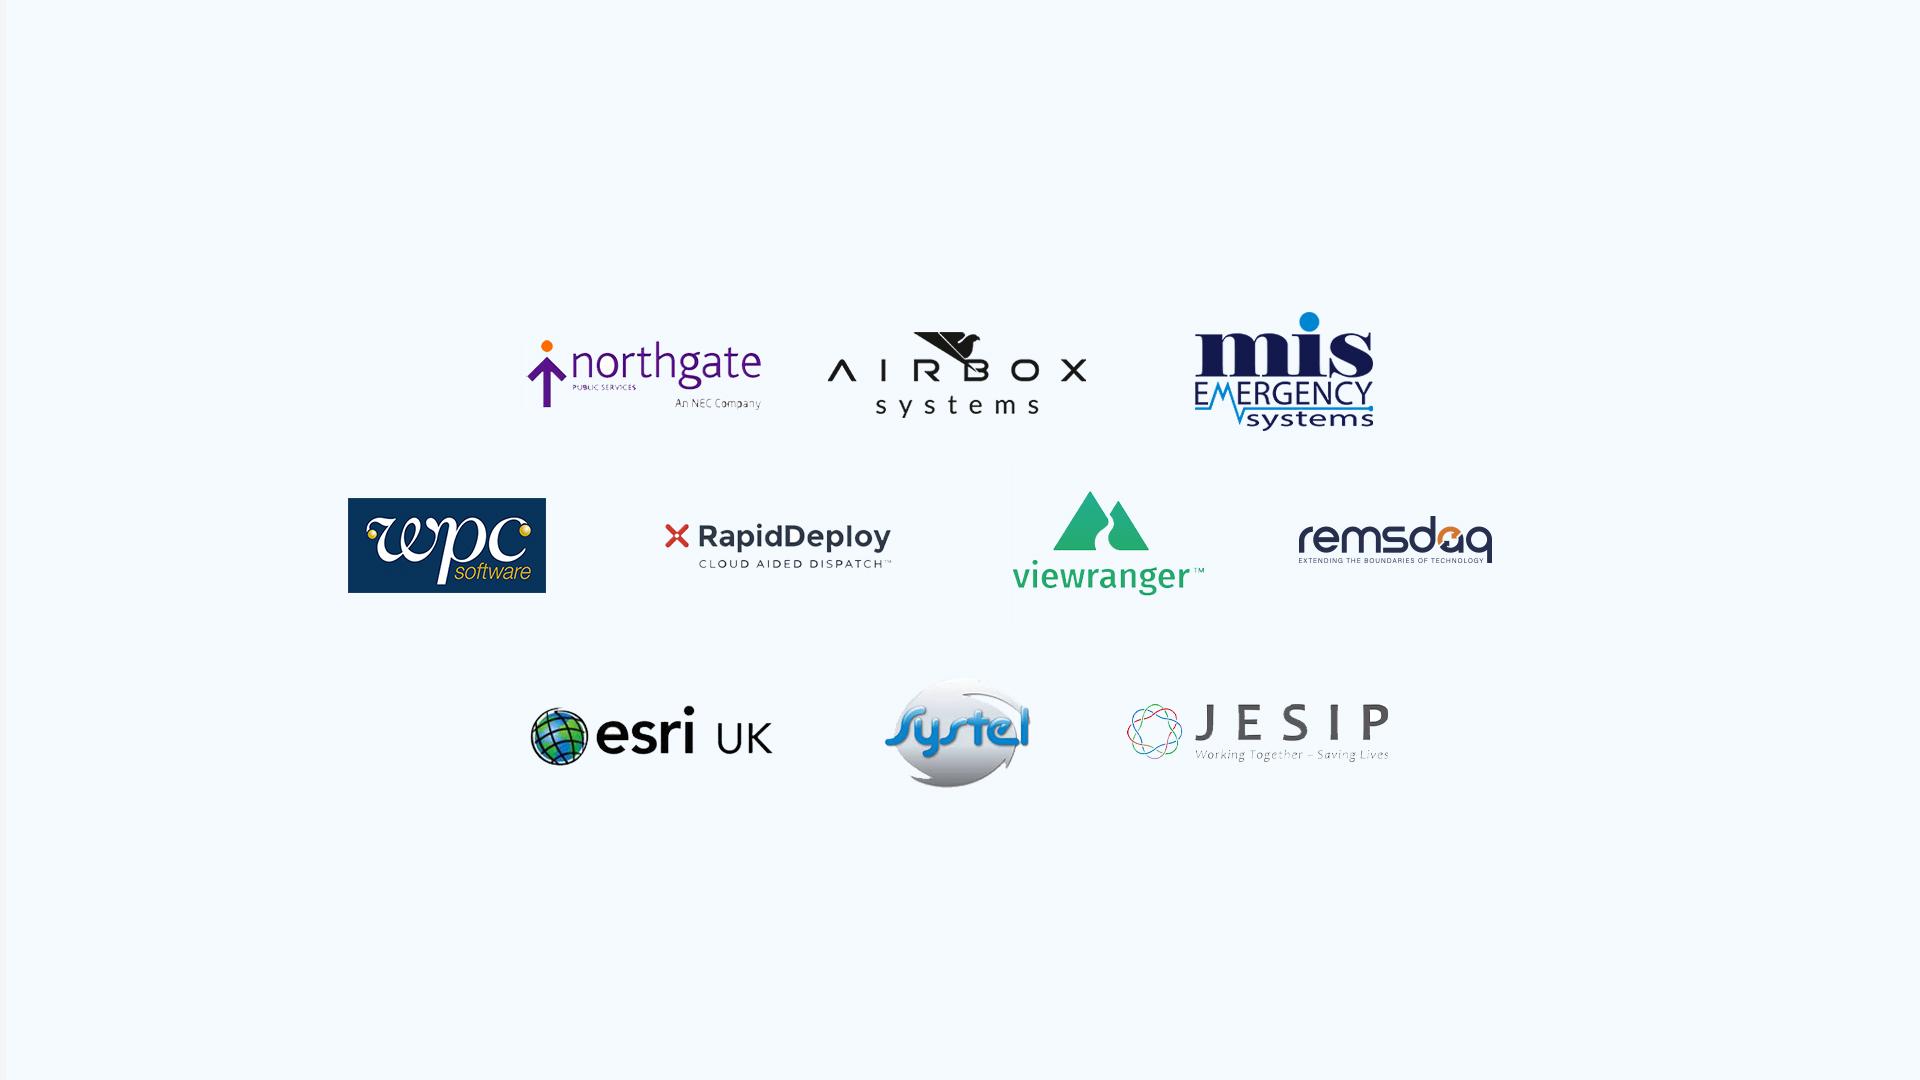 the websites mapsite control logos